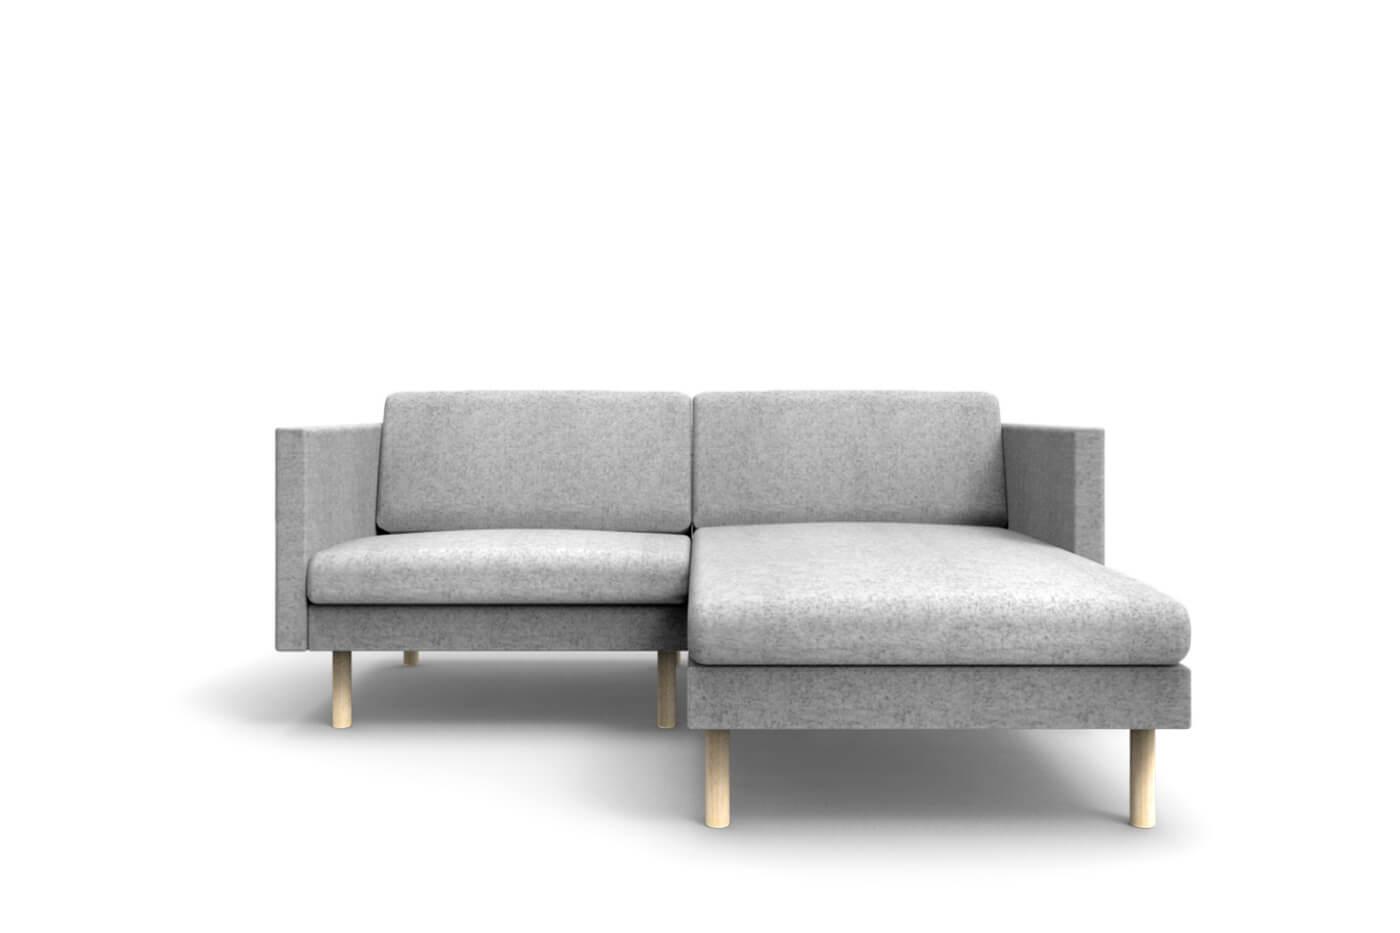 Small corner sofa leaf mini chaise lounge on right oot oot studio - Sofa chaise lounge ...